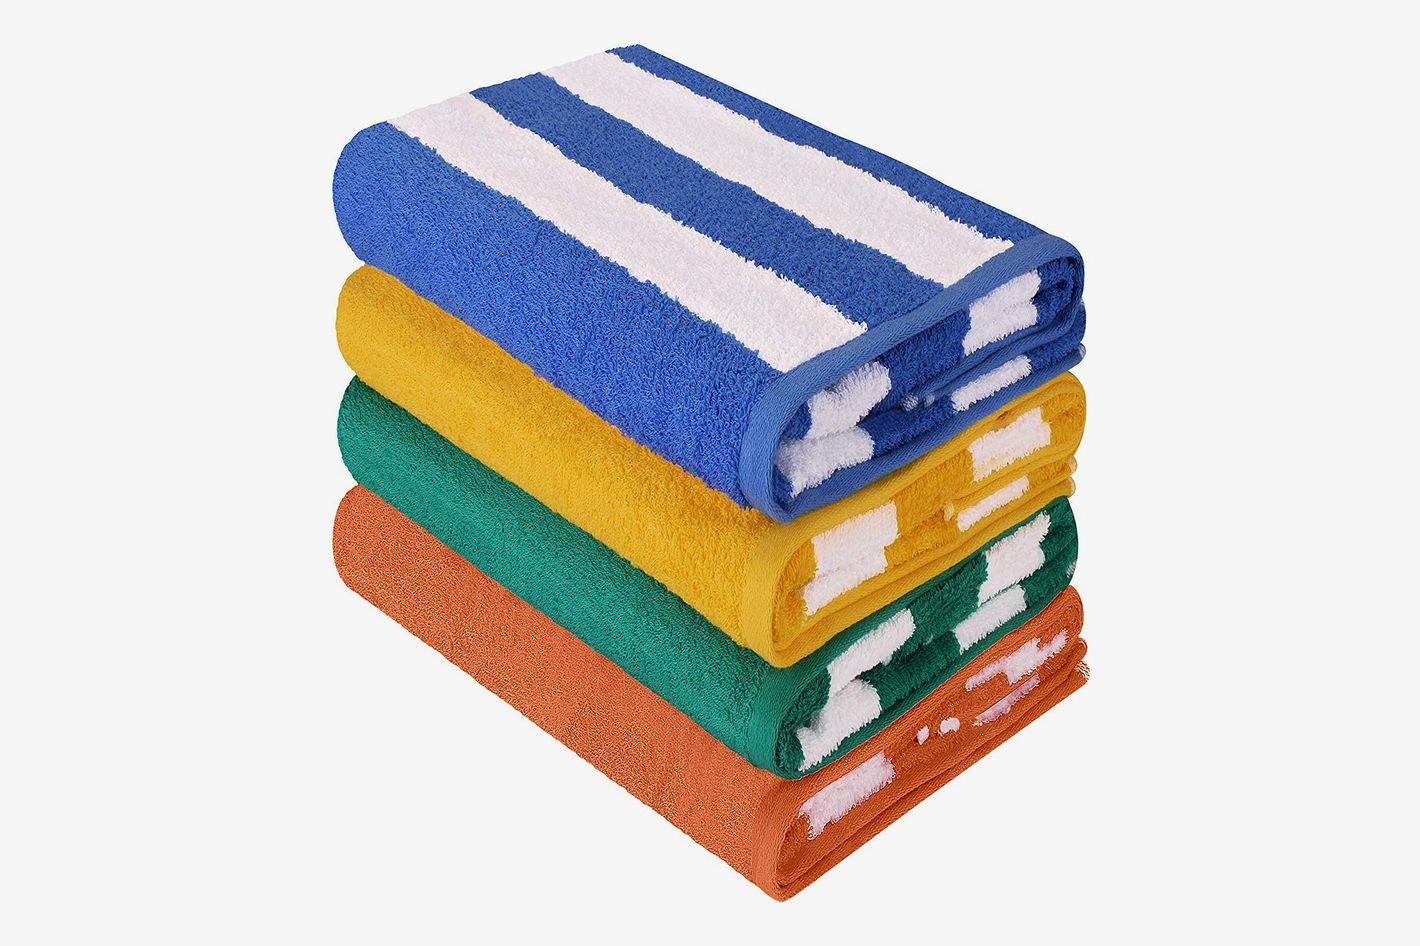 fdc8705ec6d2fc Utopia Towels Cabana Stripe Beach Towels (4 Pack, Multicolor)